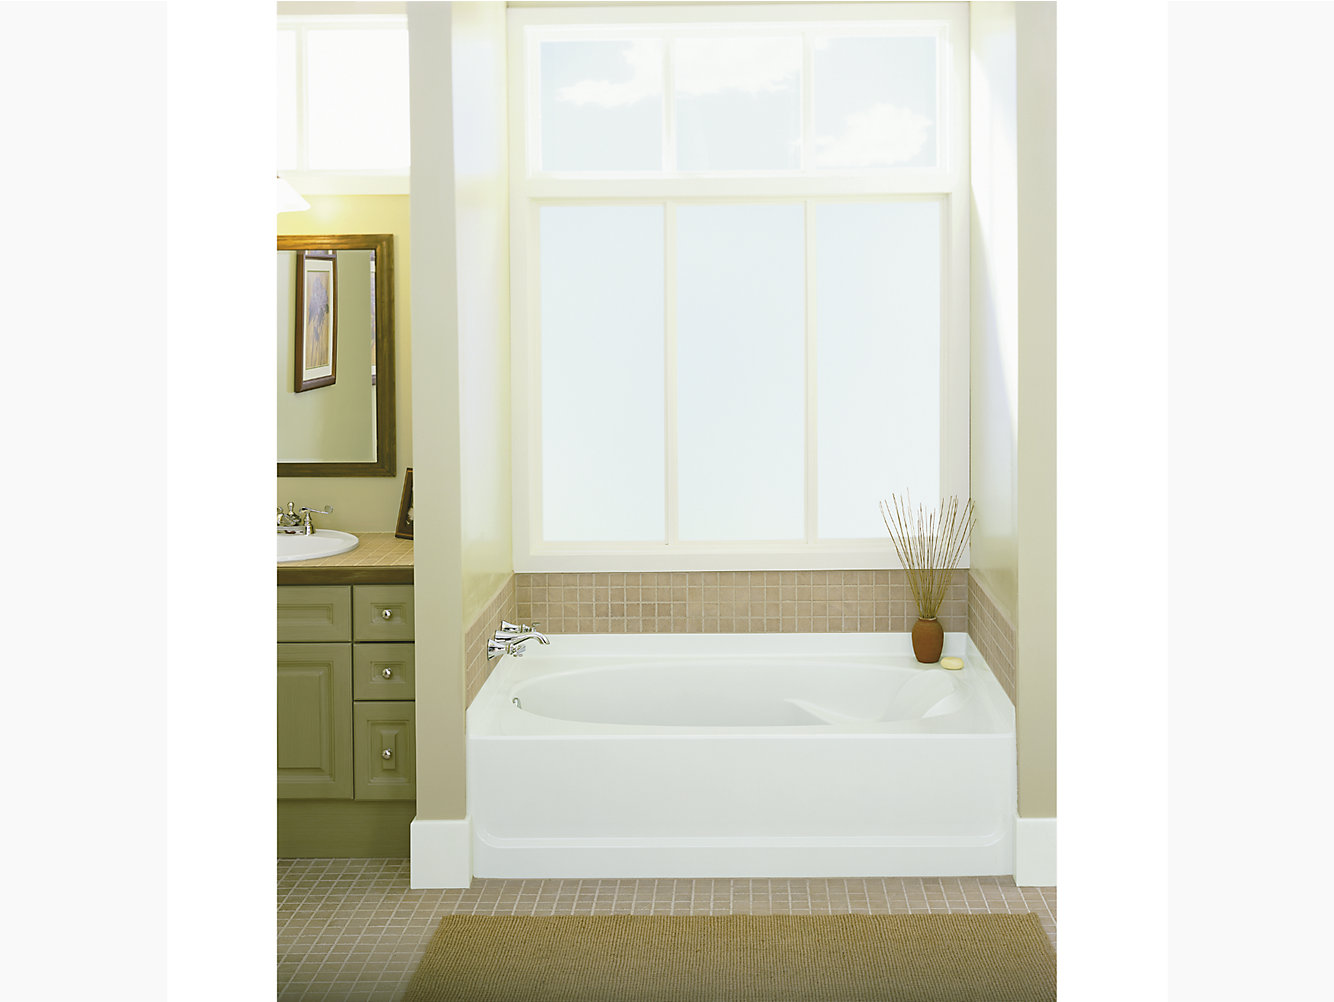 "Ensemble Series 7110, 60"" x 36"" Bath 3-Pack | 71101310 | STERLING"